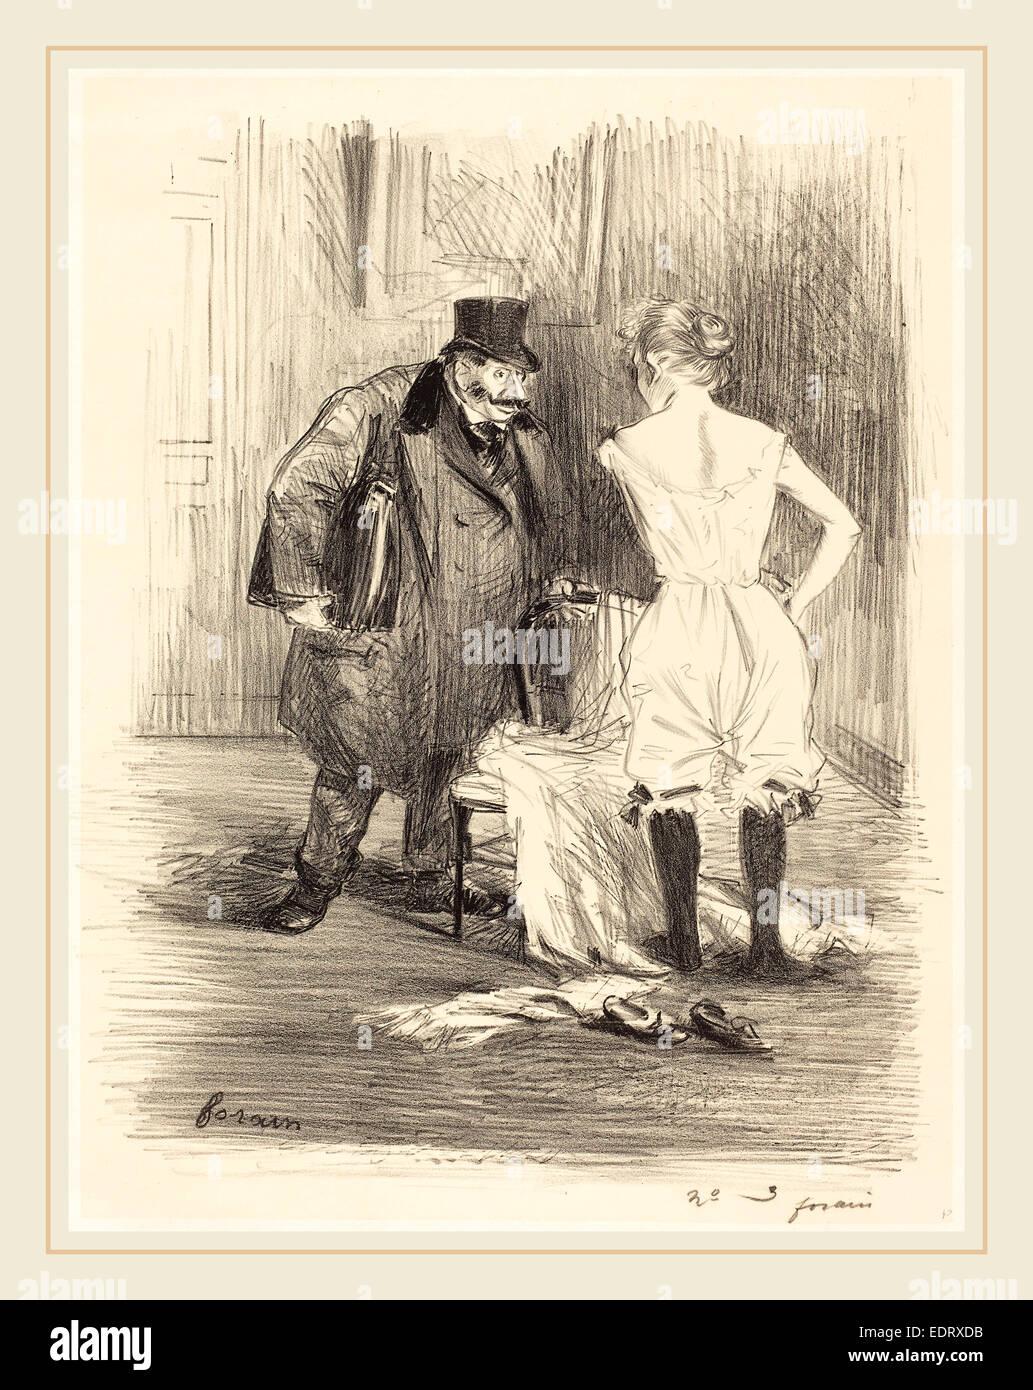 Jean-Louis Forain (French, 1852-1931), A Seizure, c. 1891, lithograph - Stock Image